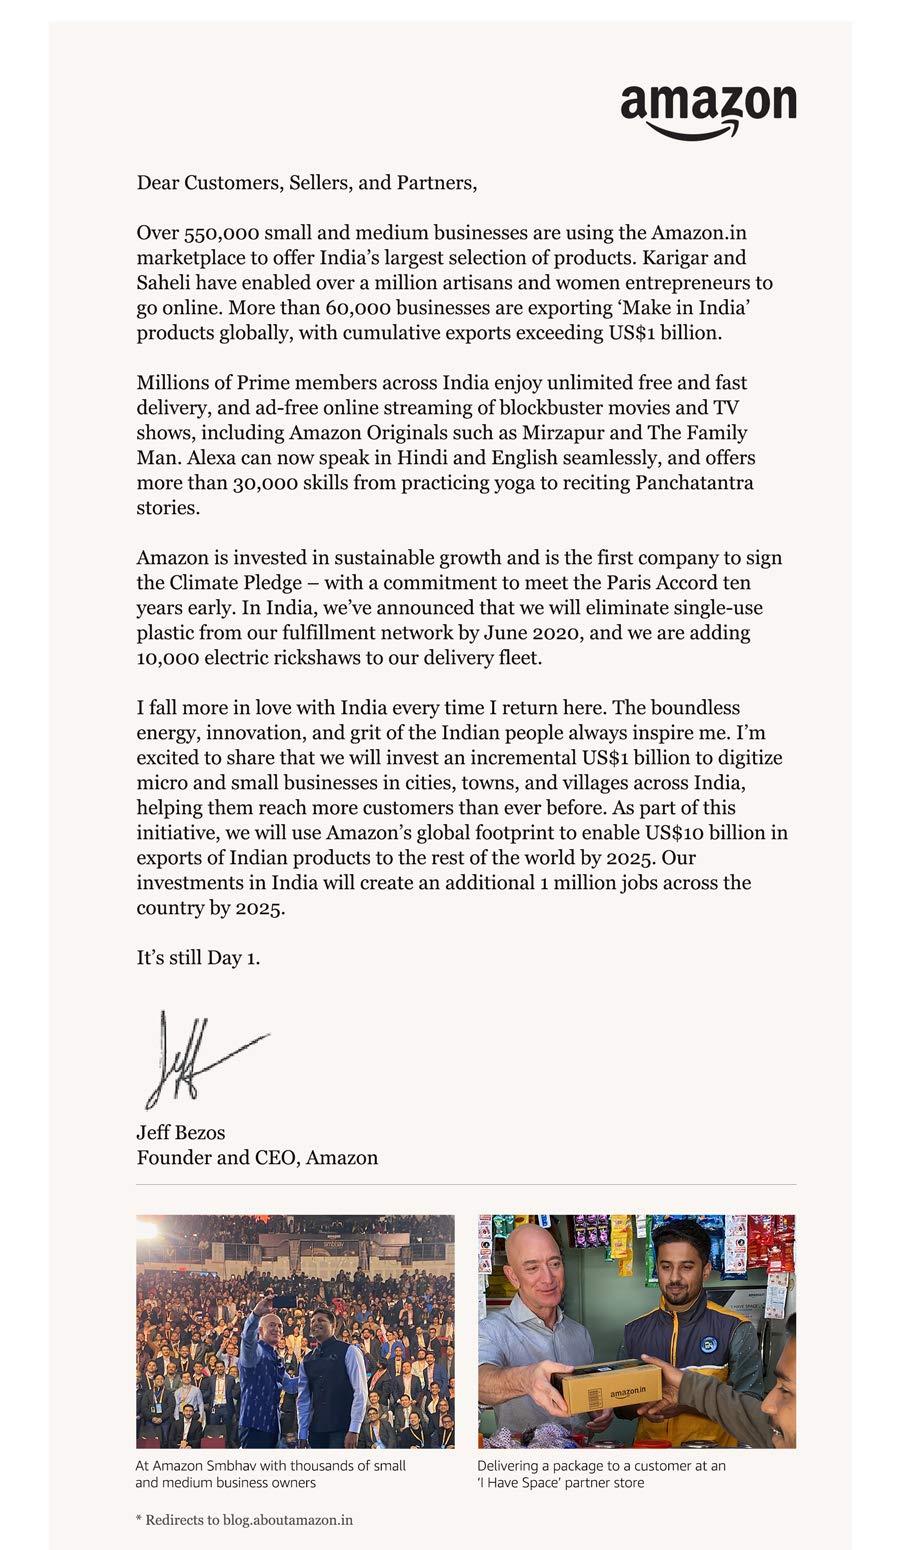 Jeff Bezos'letter